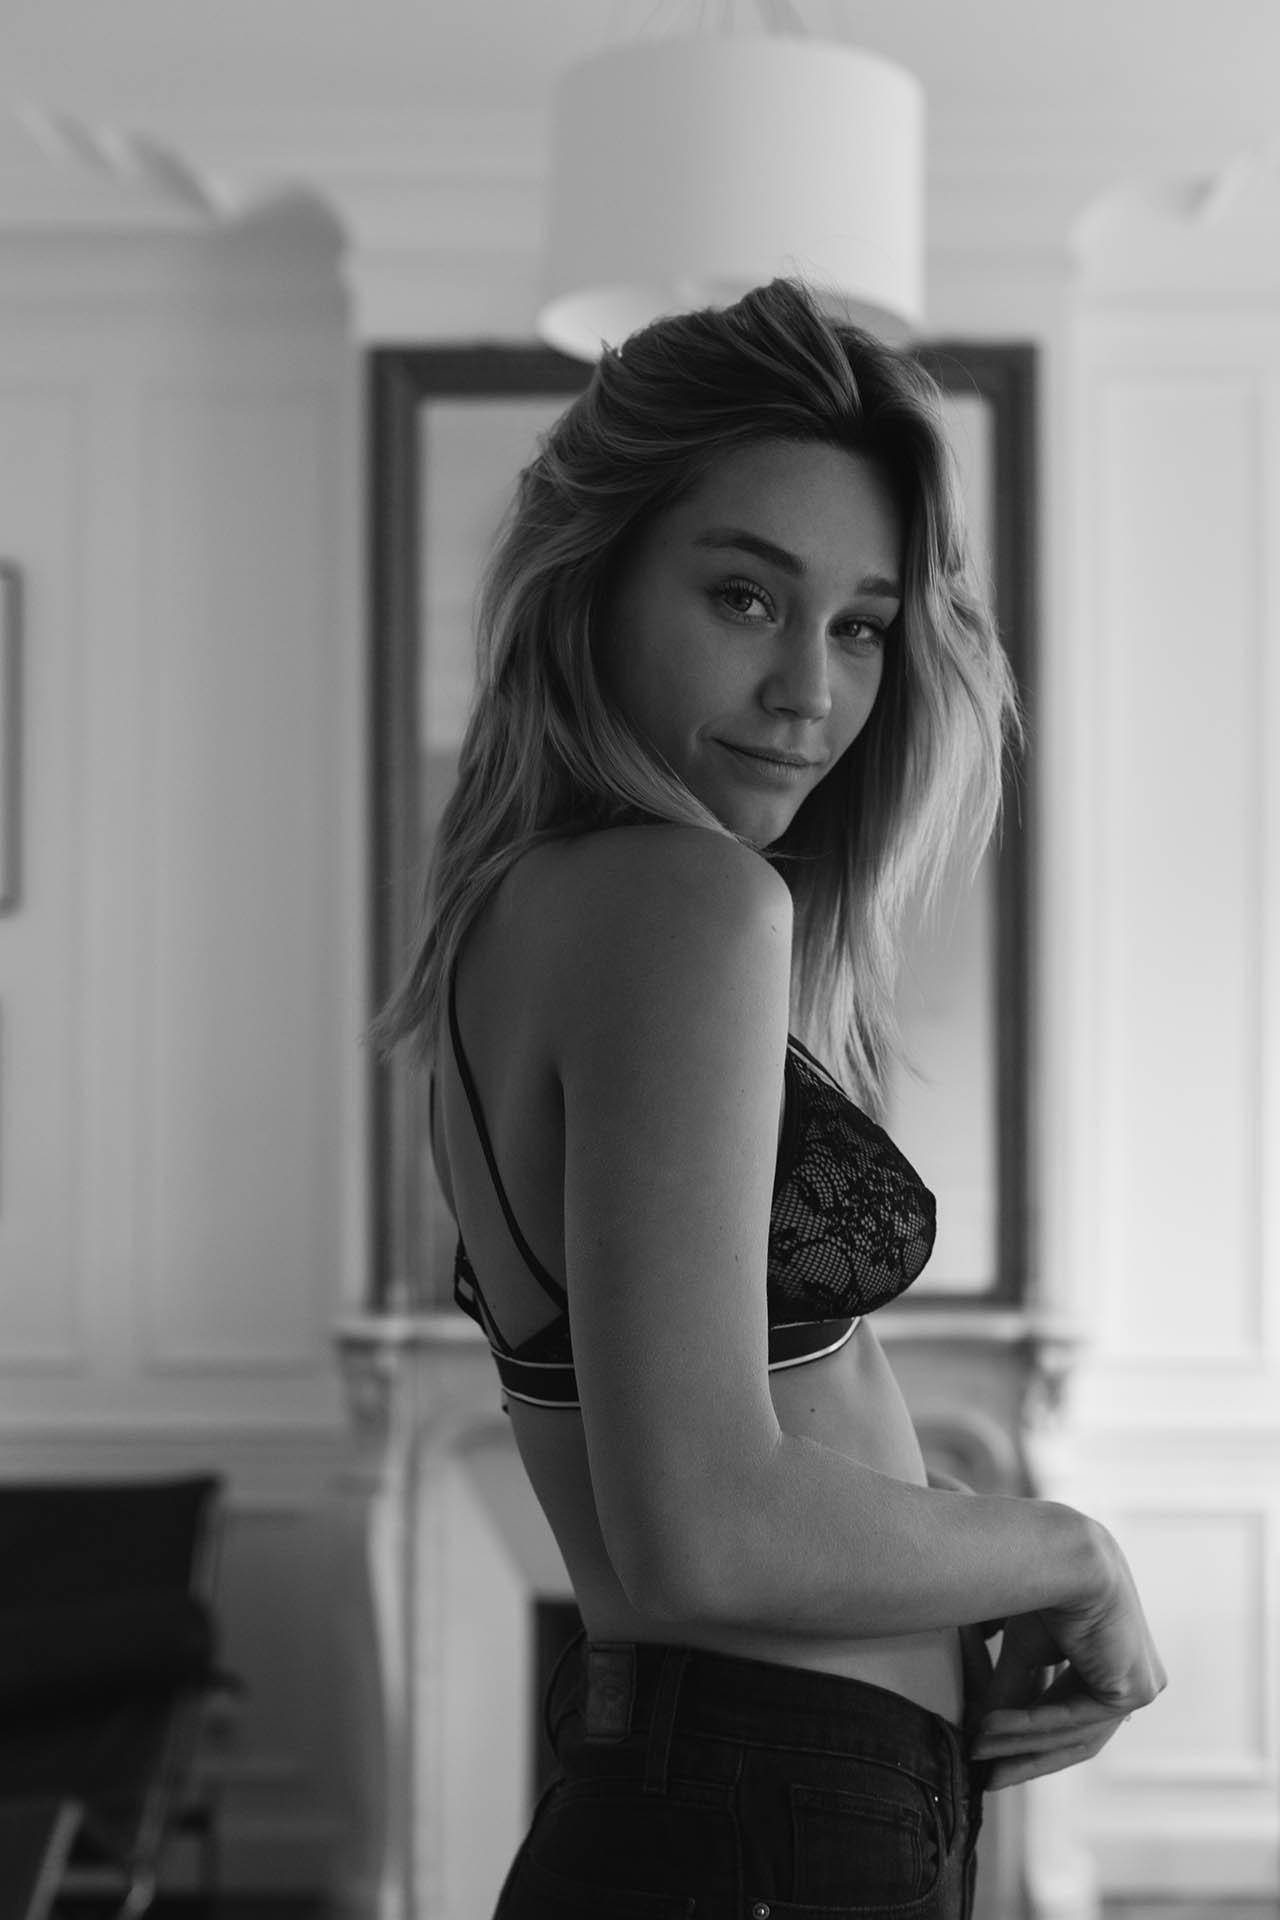 icemecri-Alison_Cossenet-lingerie-23